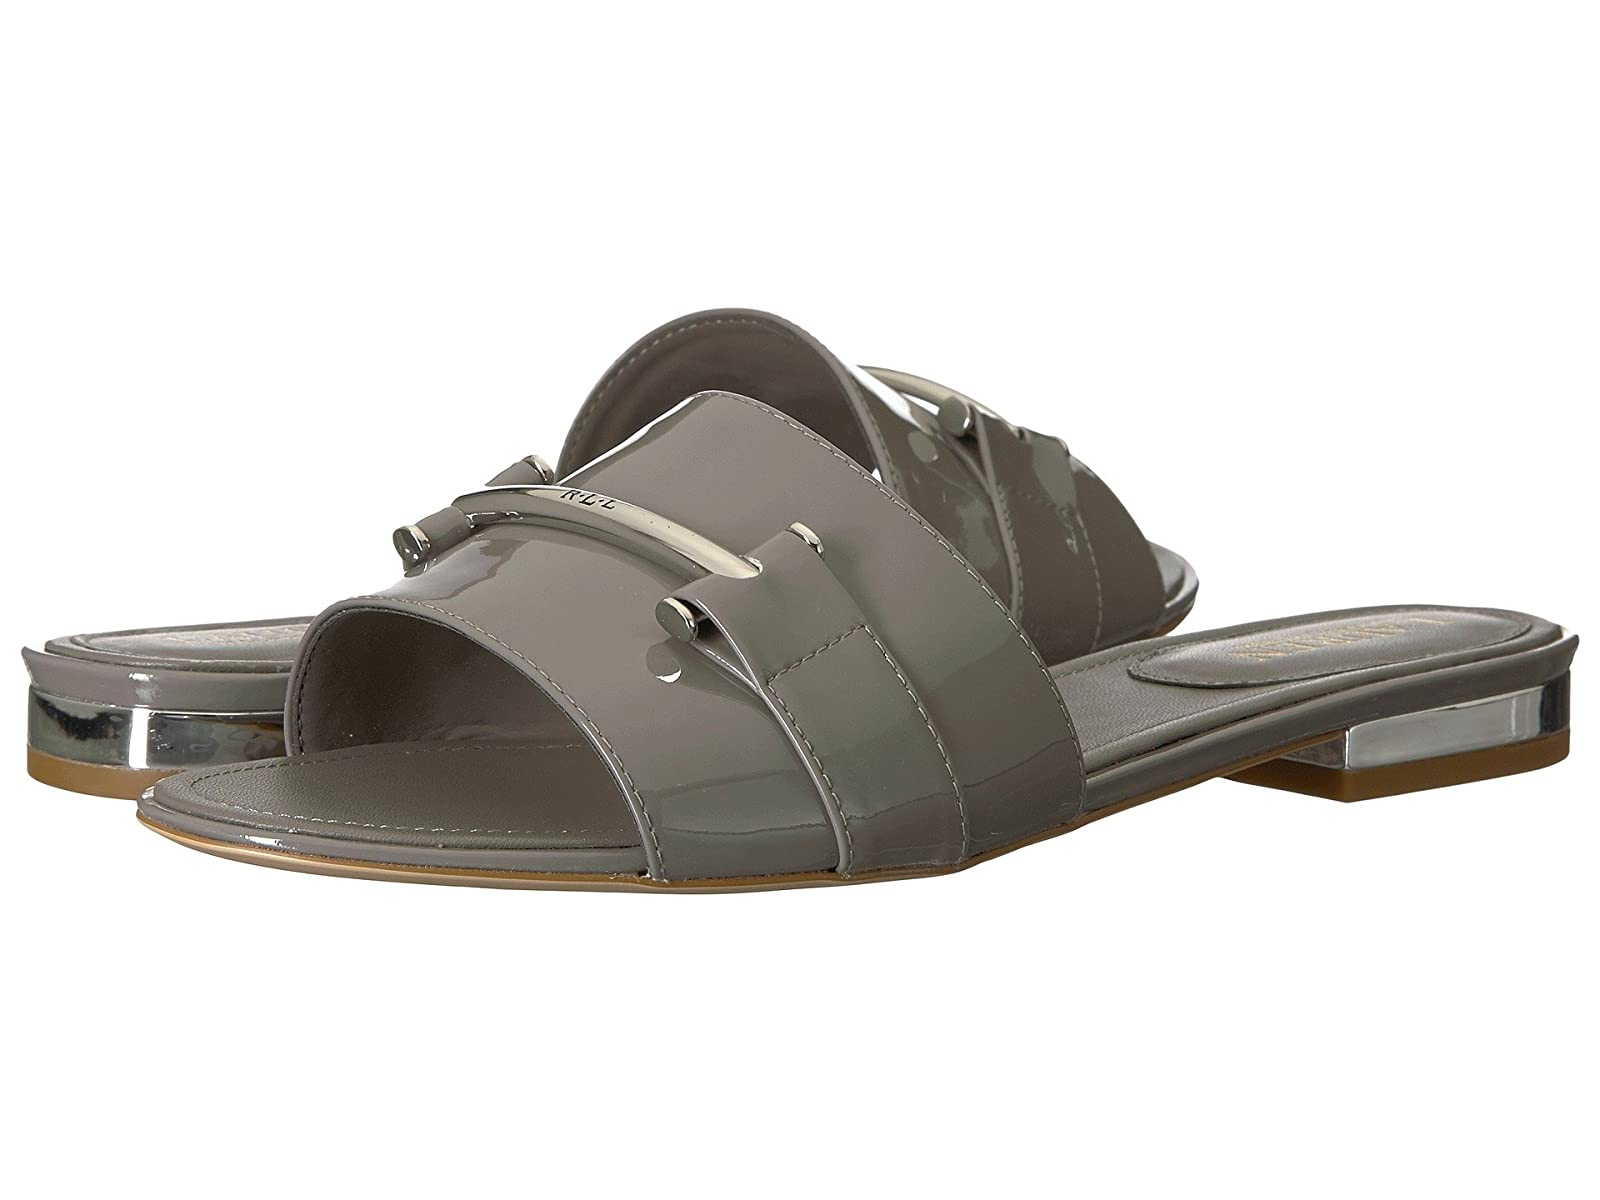 LAUREN Ralph Lauren DavanAtmospheric grades have affordable shoes